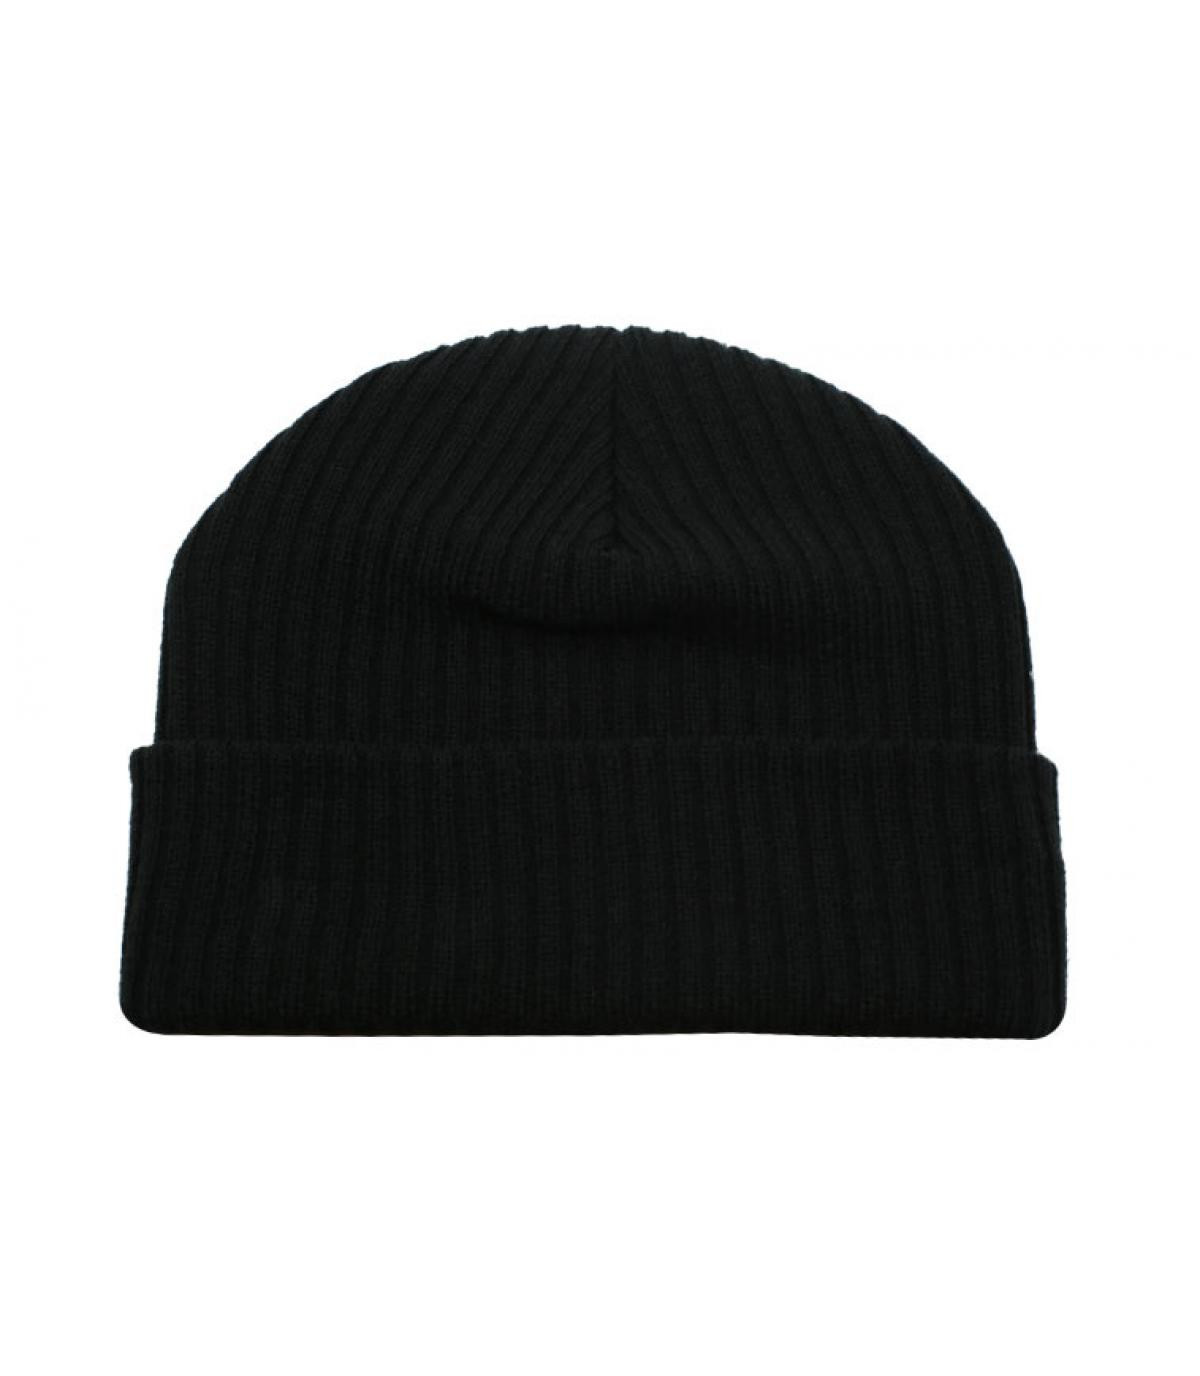 Mütze docker schwarz